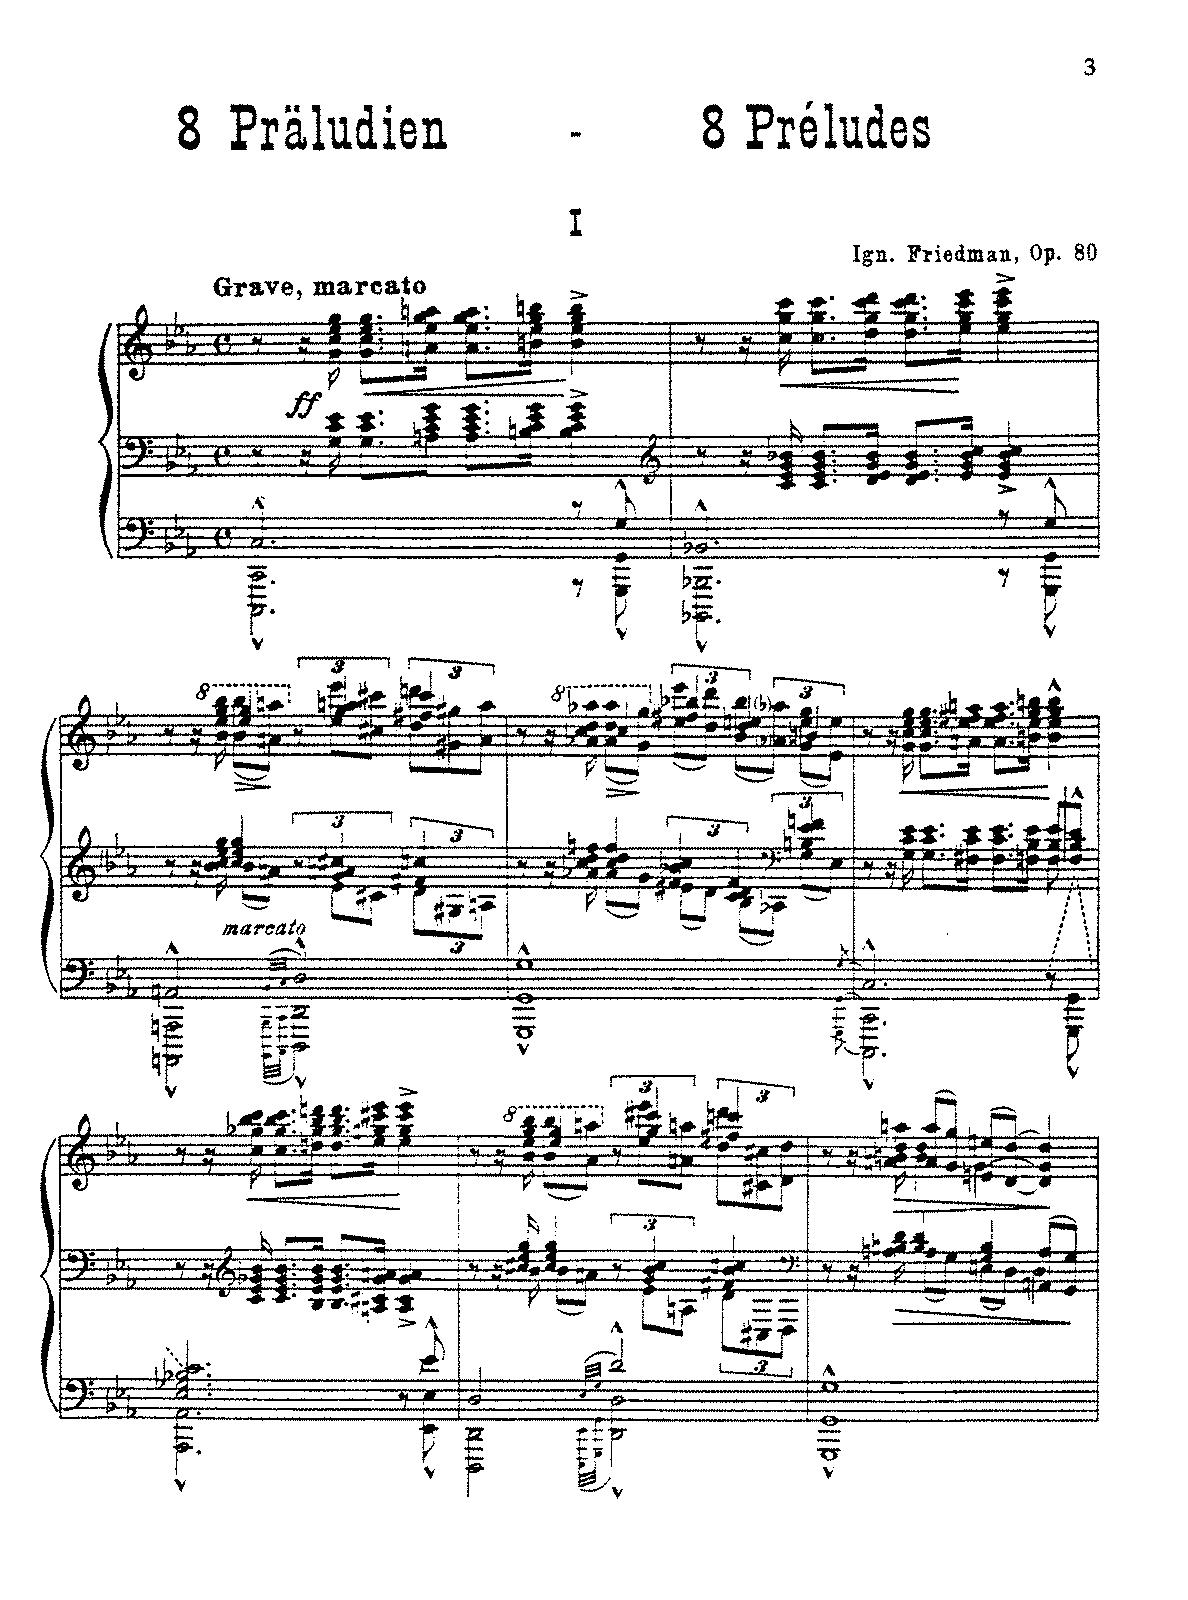 8 Preludes, Op 80 (Friedman, Ignaz) - IMSLP/Petrucci Music